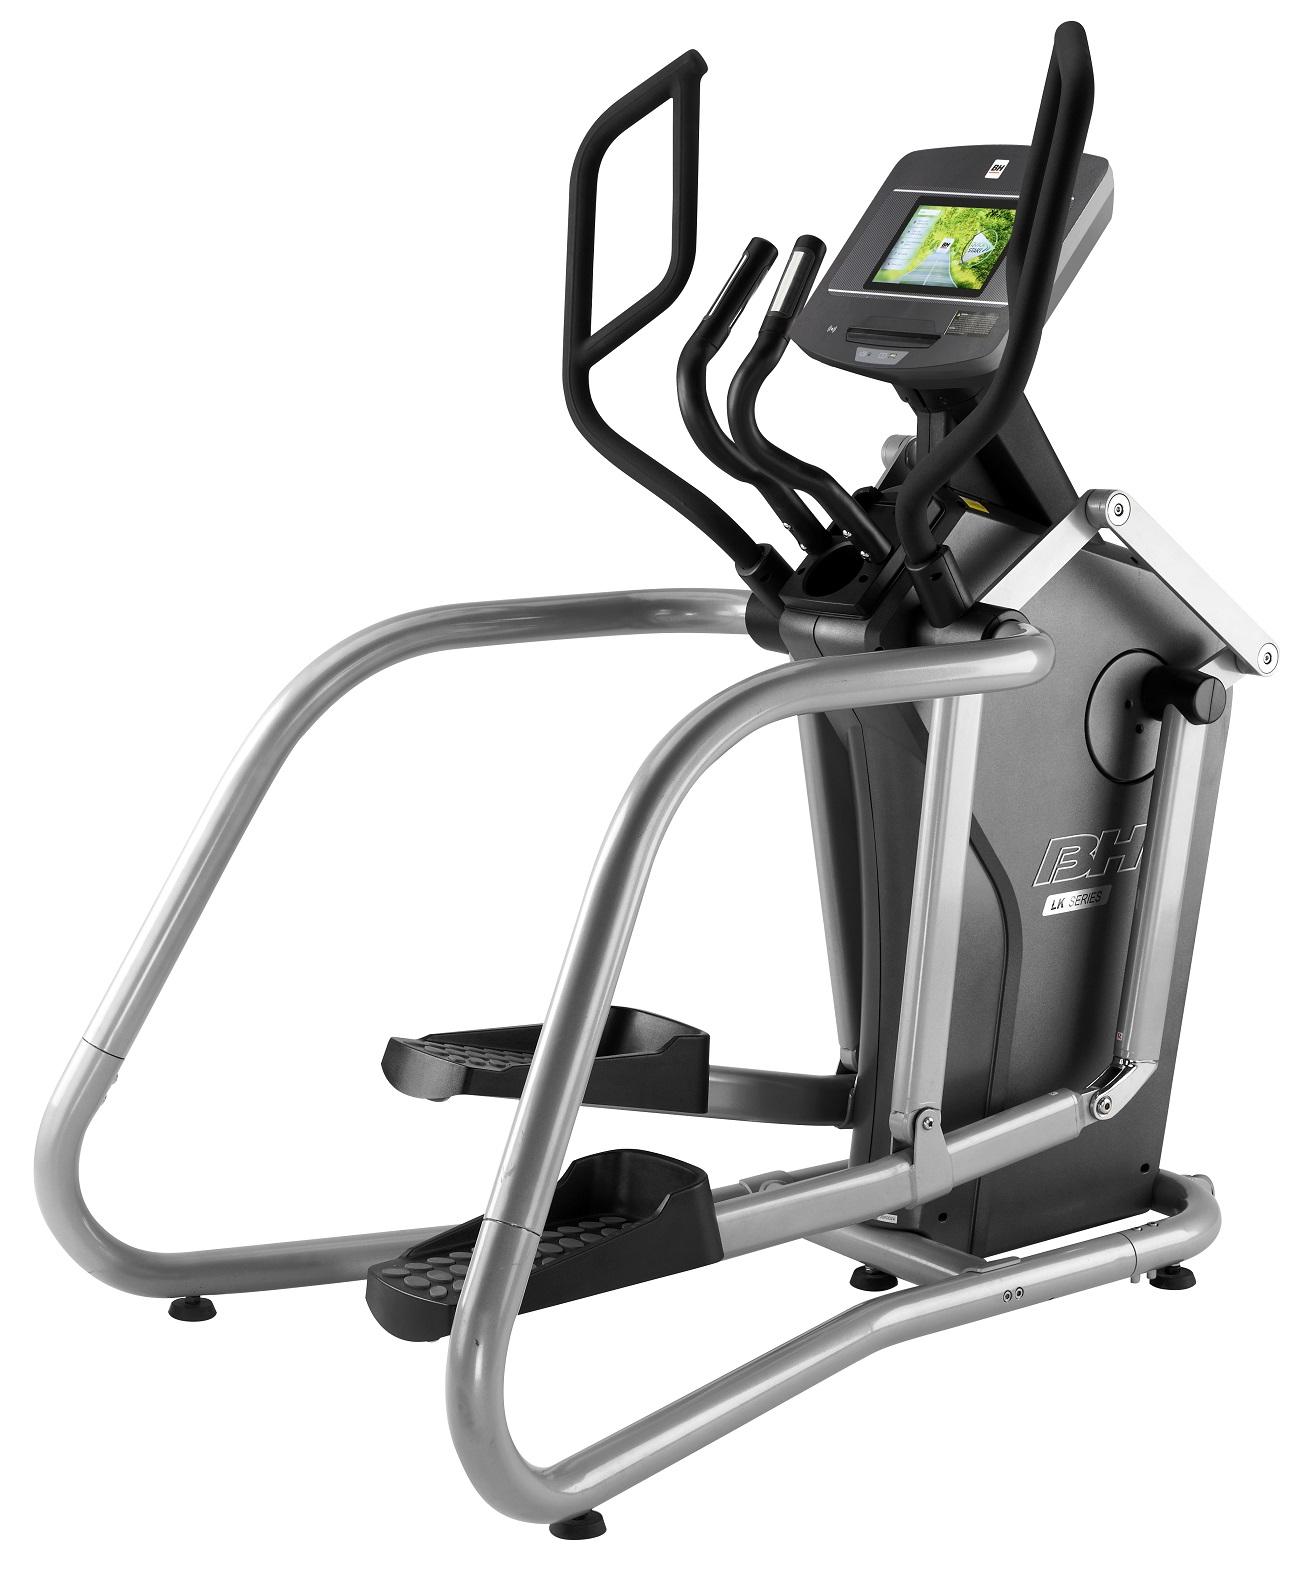 BH Fitness LK8180 SmartFocus